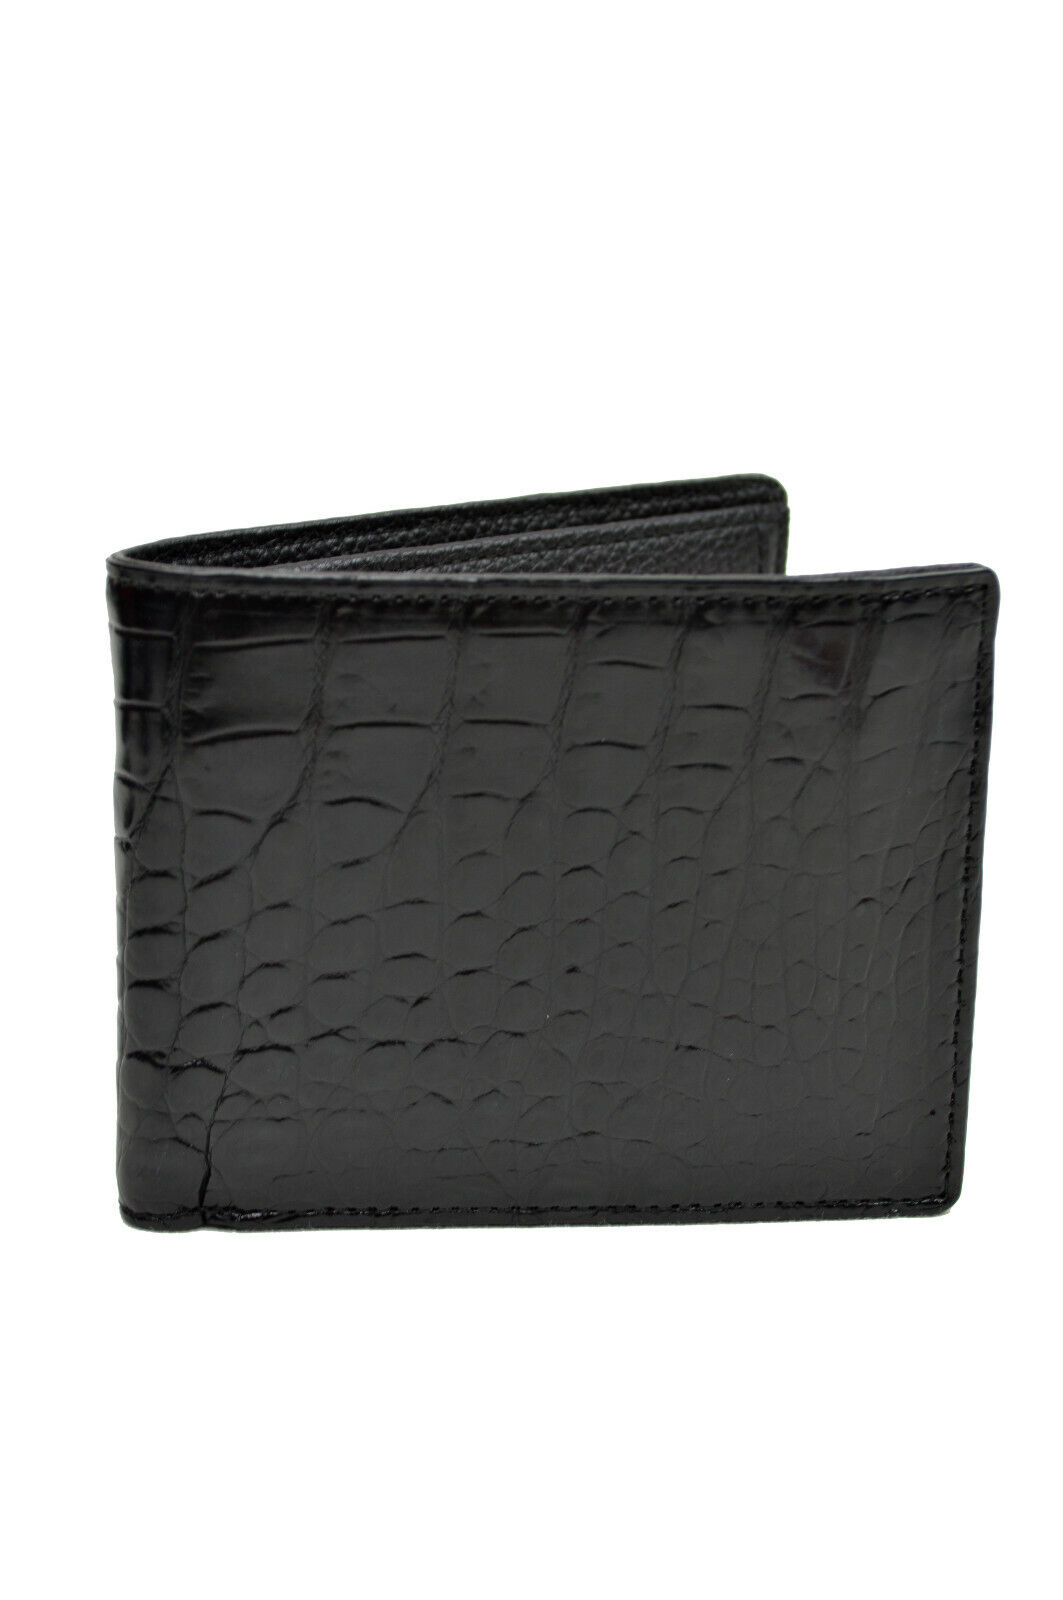 Fashion Mens Black Crocodile Leather Bifold Wallet With ID Card Slot 8117-5